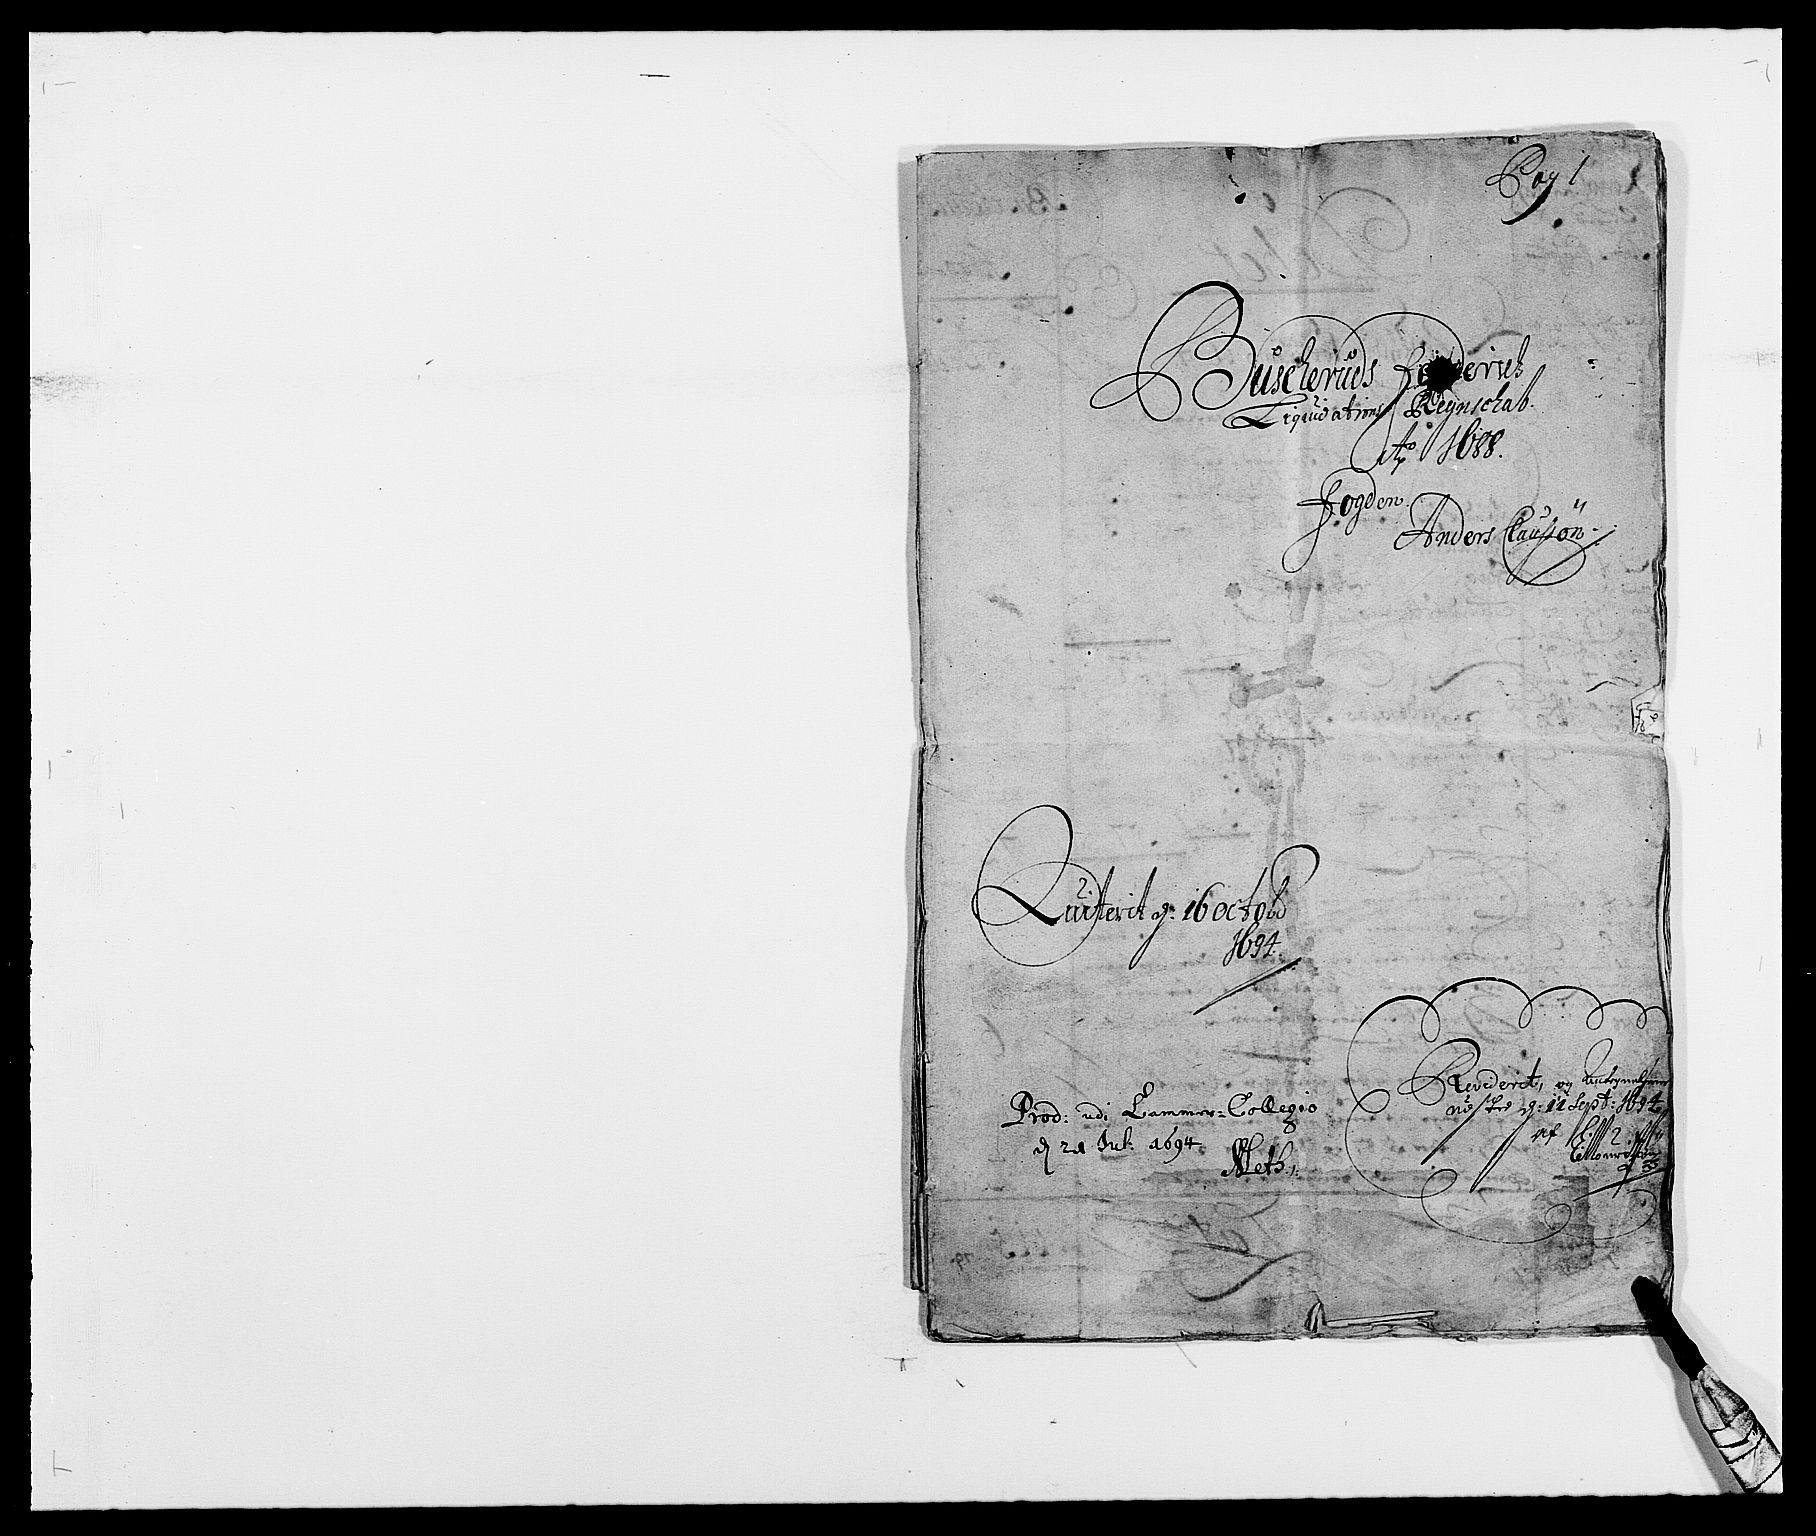 RA, Rentekammeret inntil 1814, Reviderte regnskaper, Fogderegnskap, R25/L1679: Fogderegnskap Buskerud, 1687-1688, s. 244